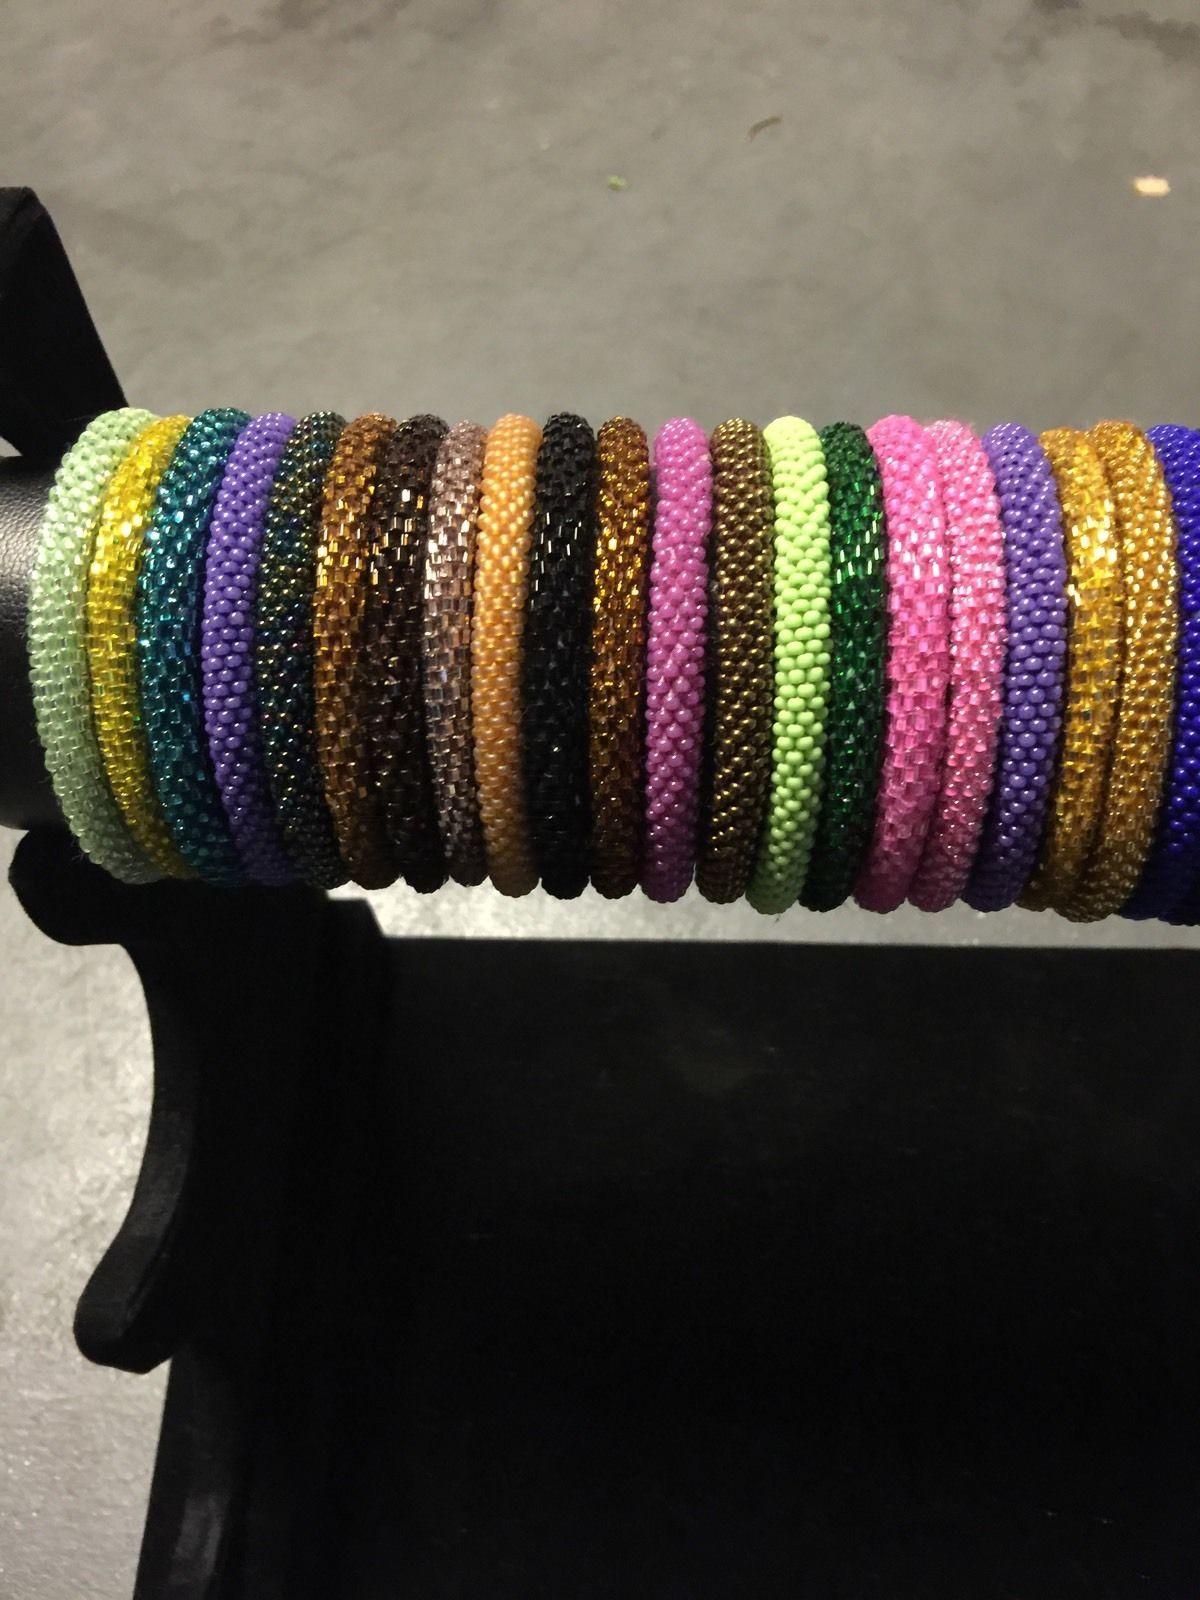 * USA 50 SET Nepal Rolls Glass Seed Bead Bracelet crochet handmade bangle Solid